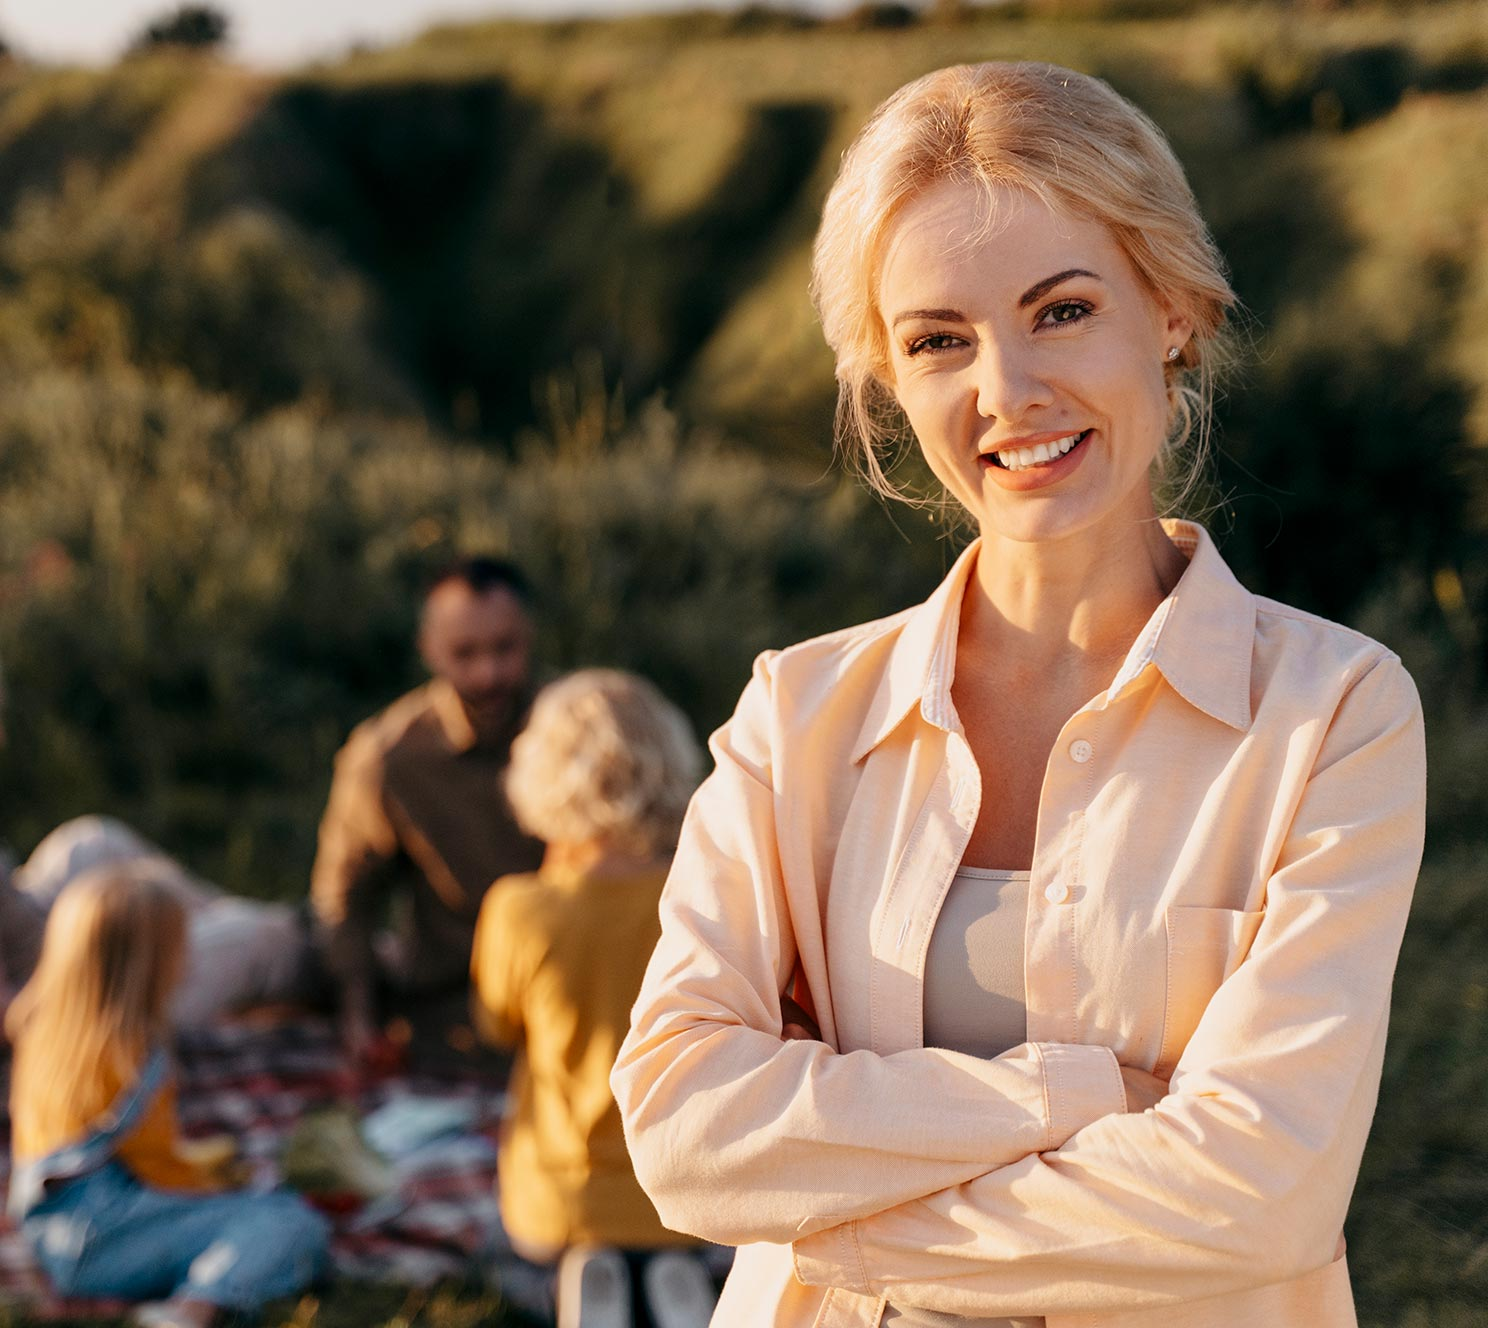 donna bionda sorridente in campagna